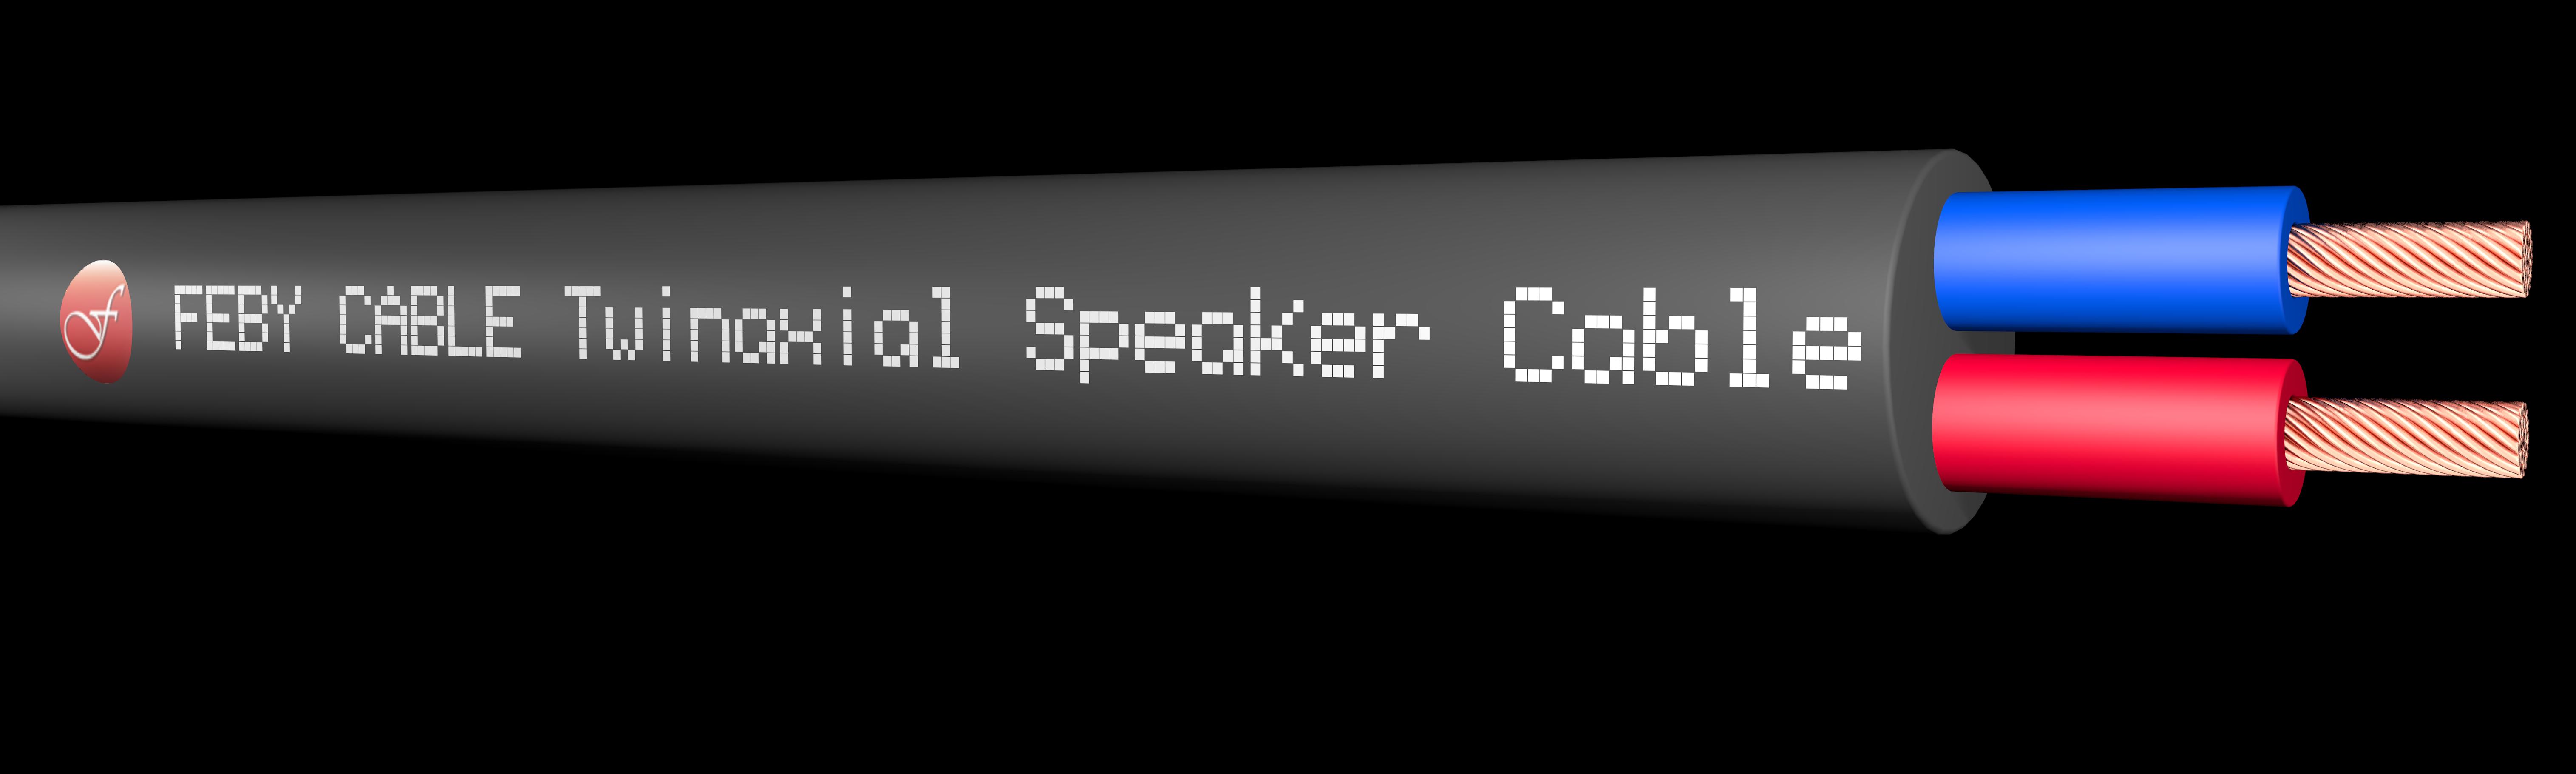 Ülkü Kablo 2x1.50 mm² Twinaxial Hoparlör Kablosu